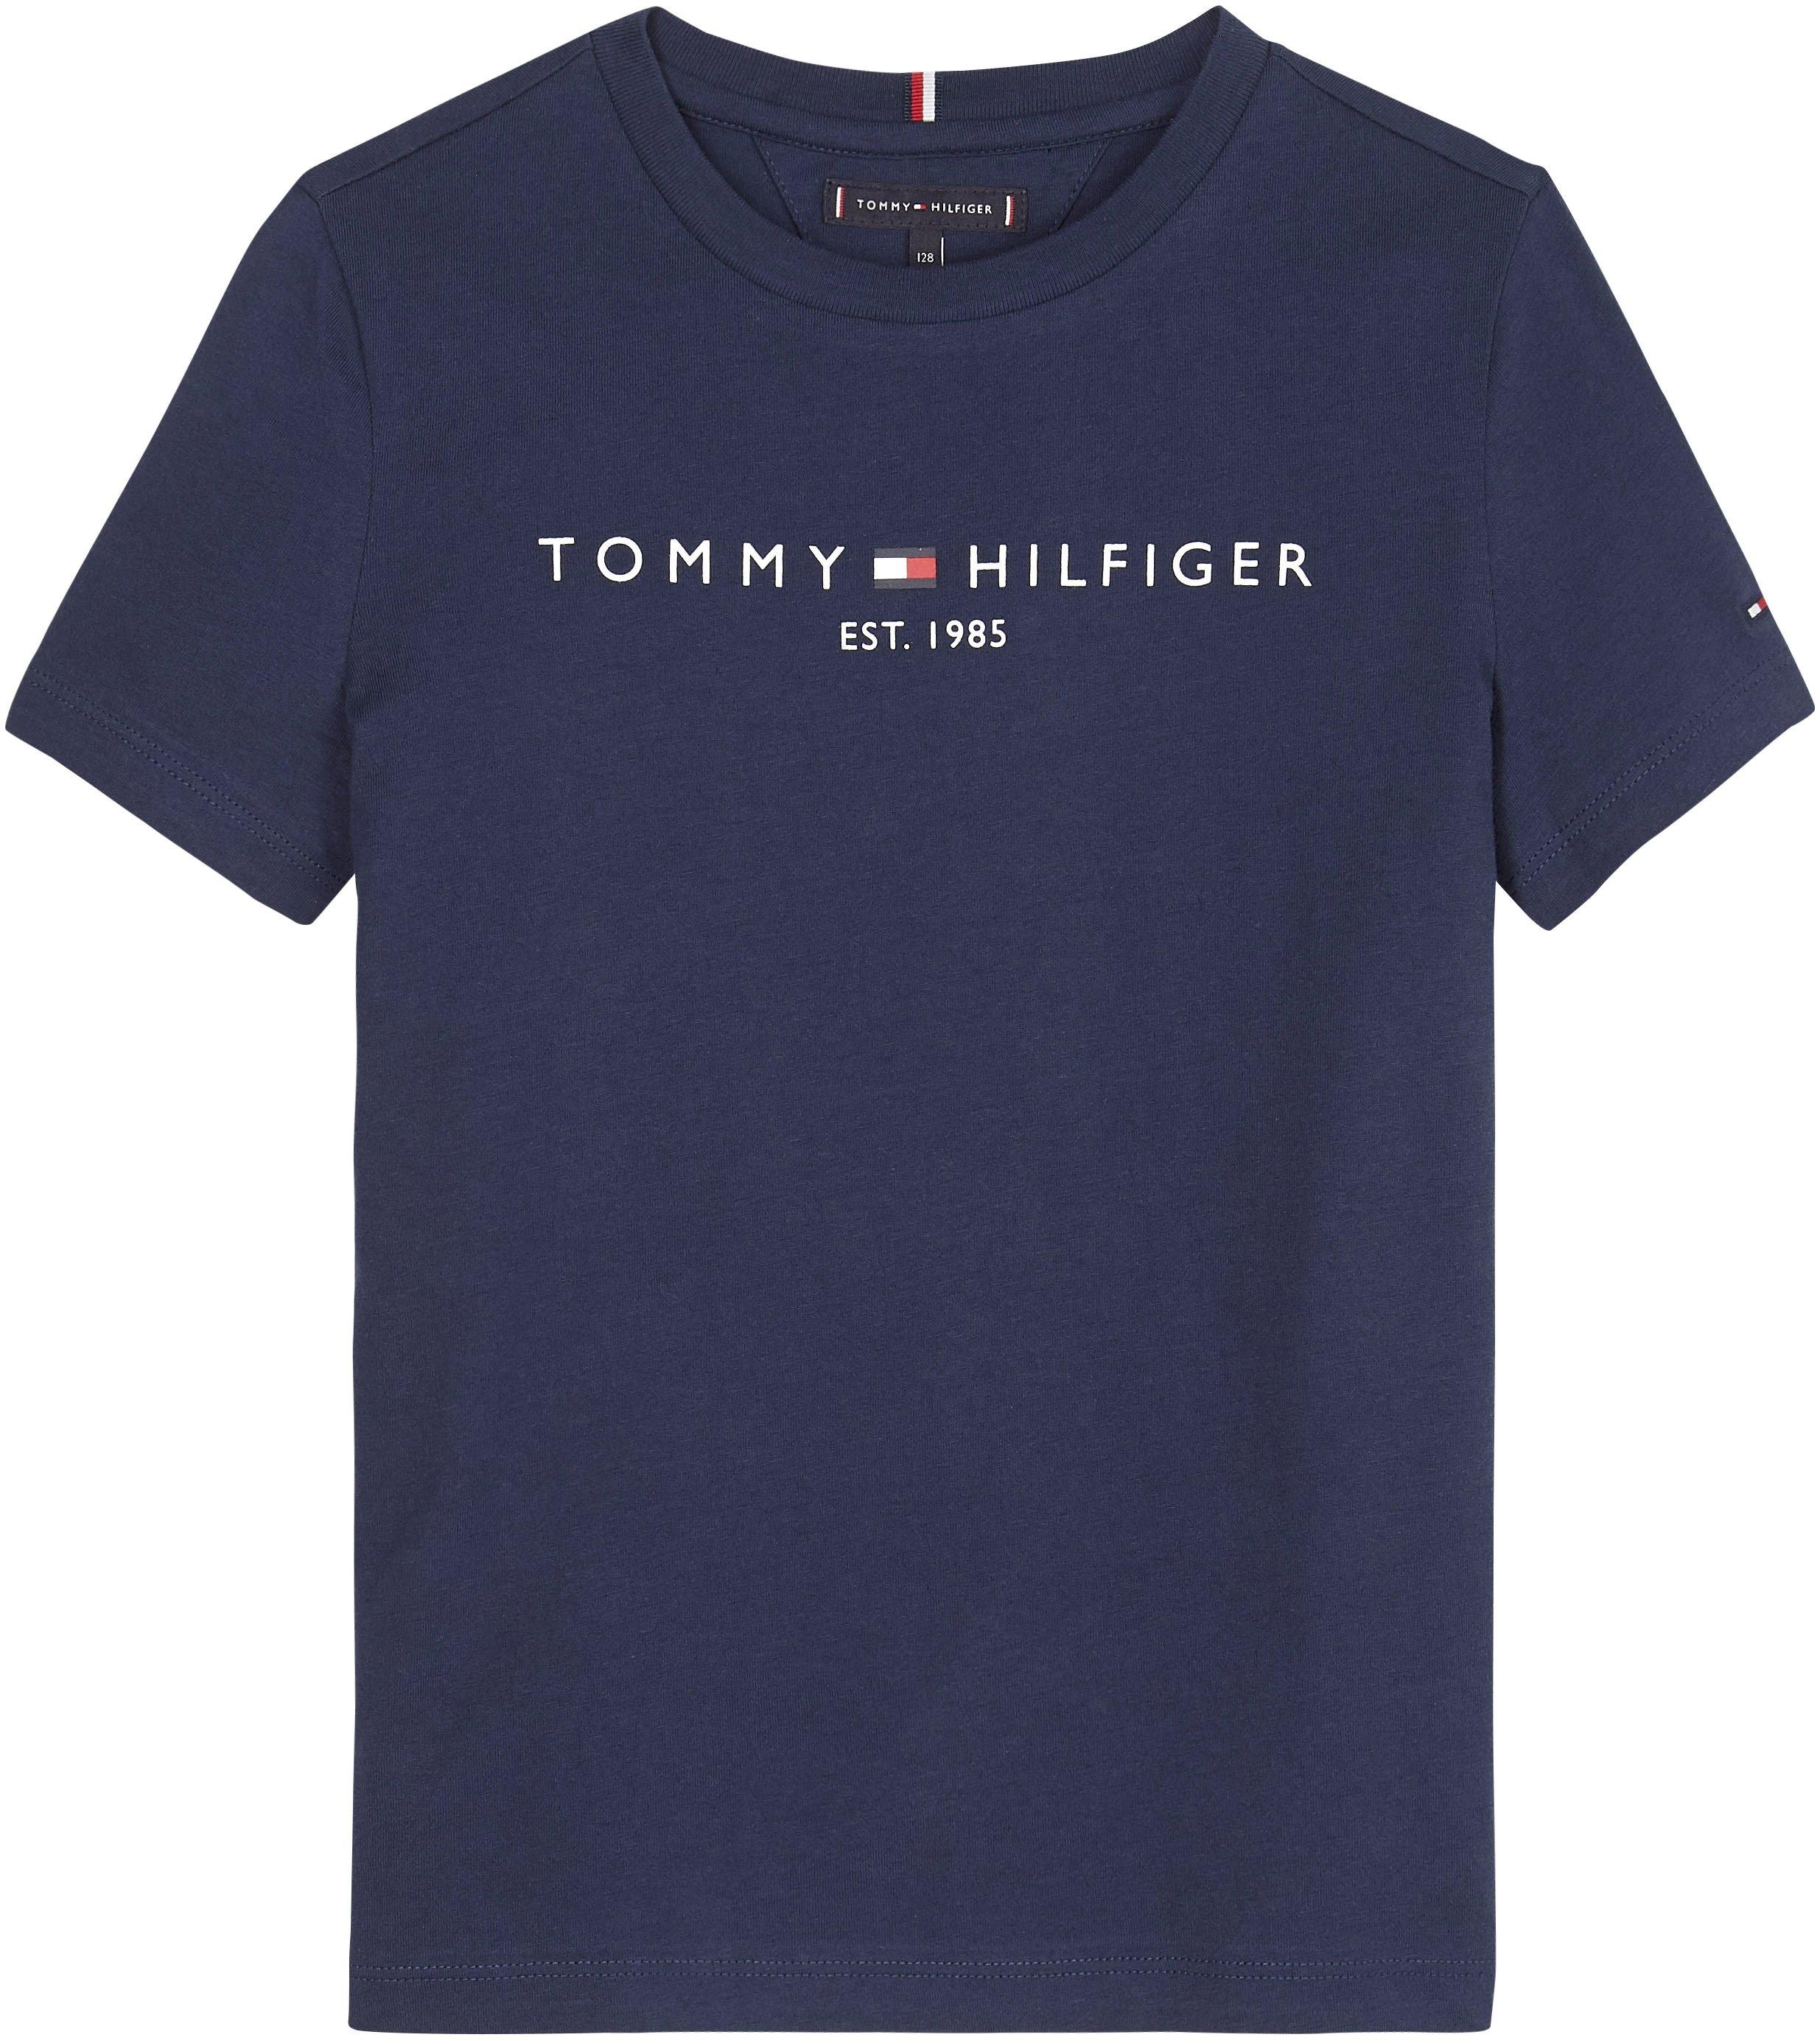 Tommy Hilfiger T-shirt voordelig en veilig online kopen